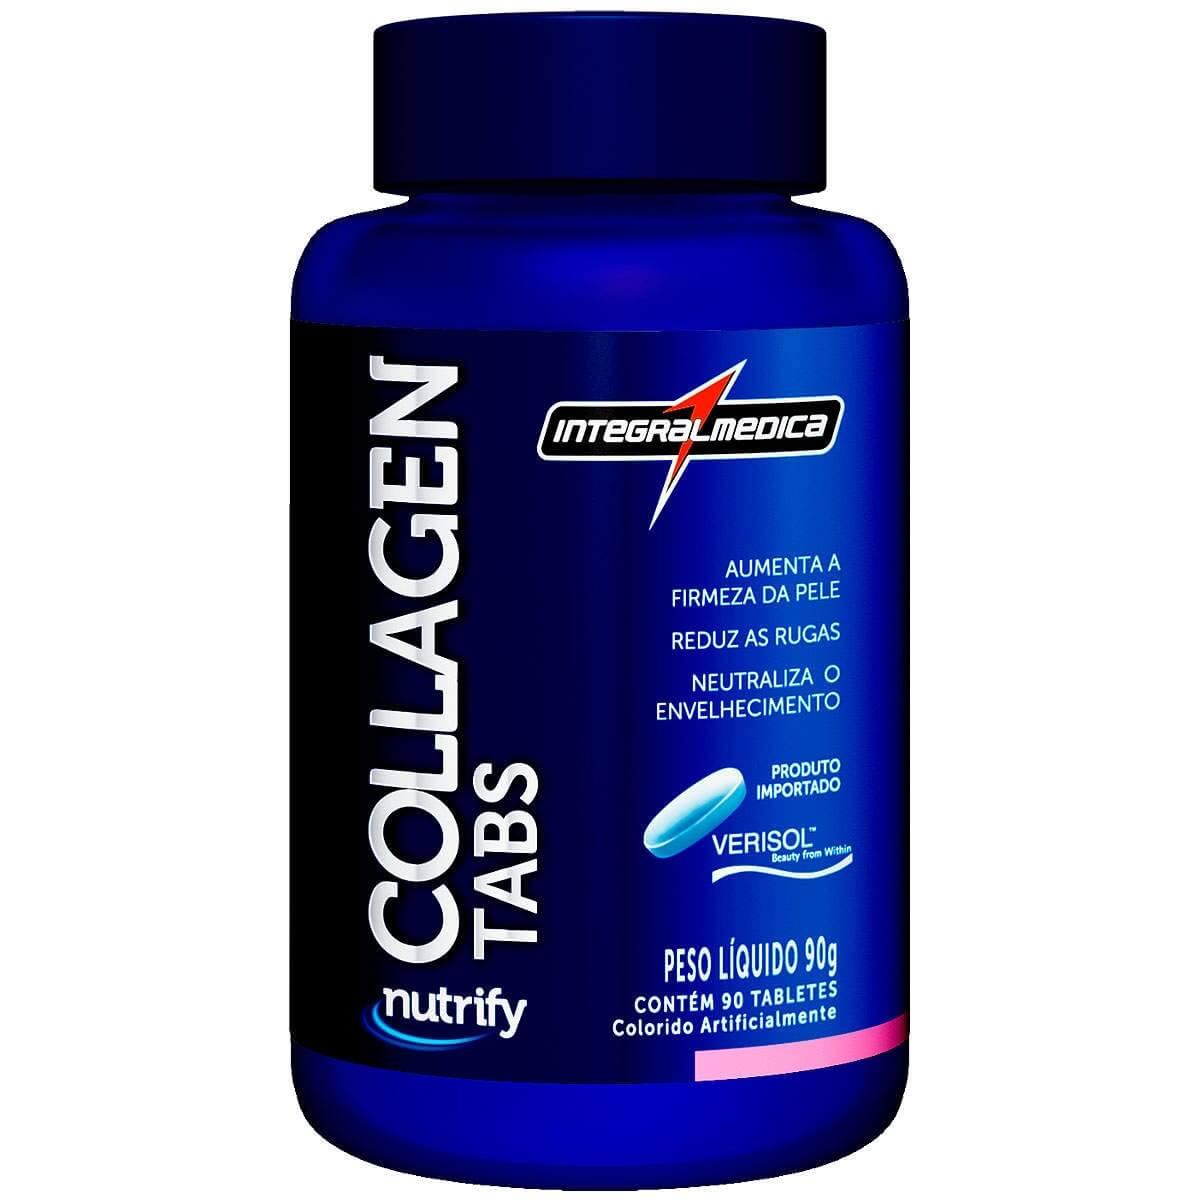 Collagen Tabs IntegralMedica - 90 tabs